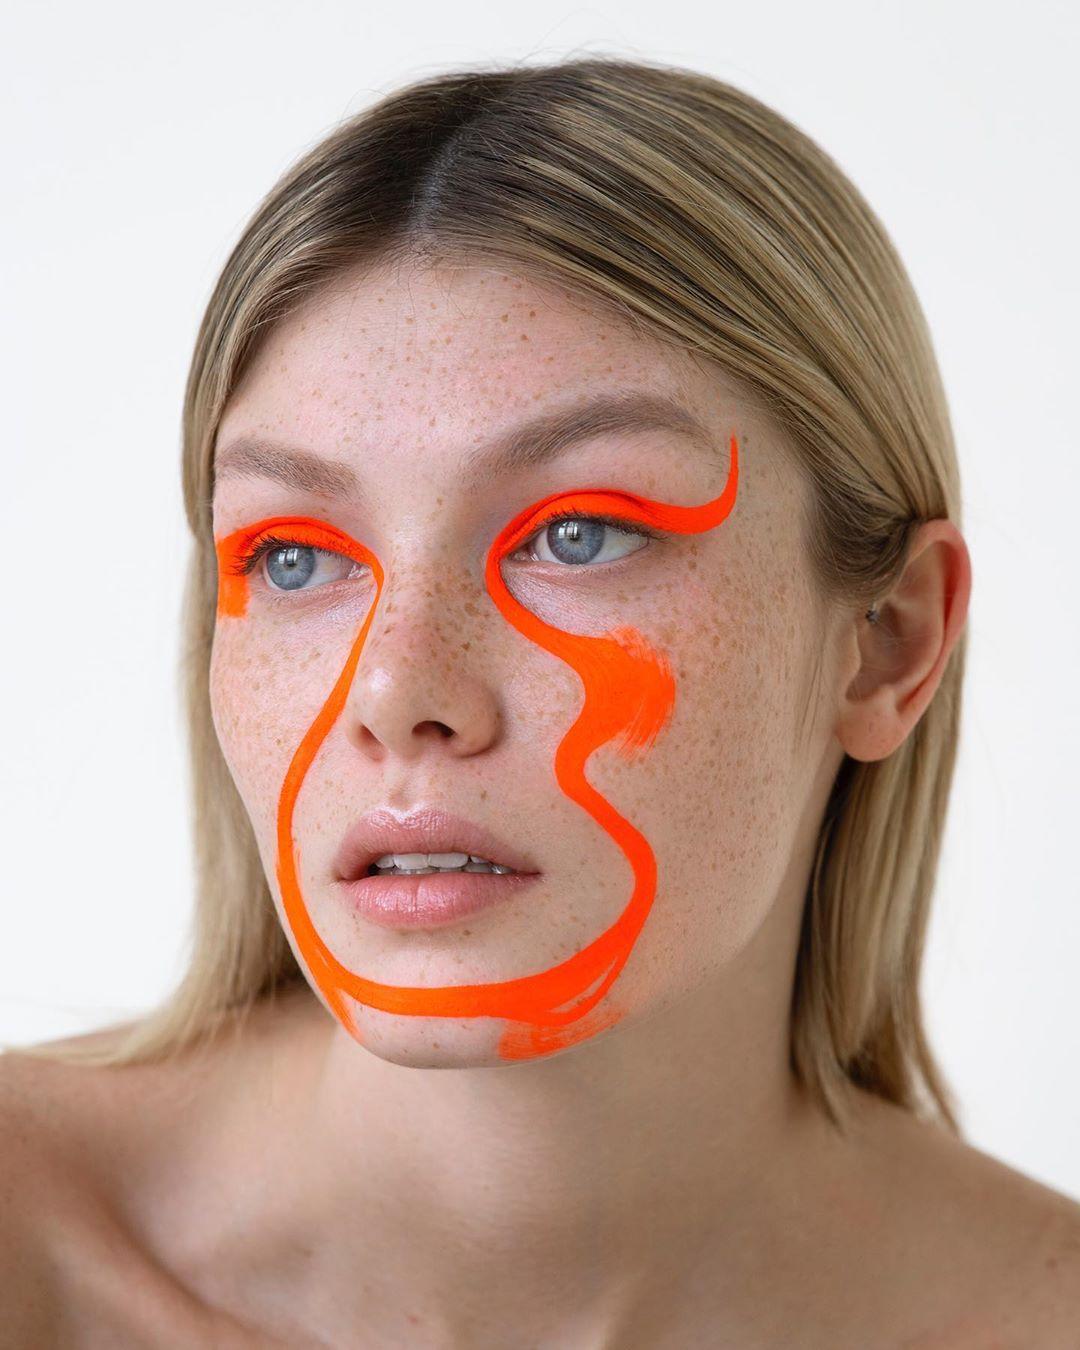 Olivia Mojica Sex Tape Video and Photos - 'Hardcore Idol' ...